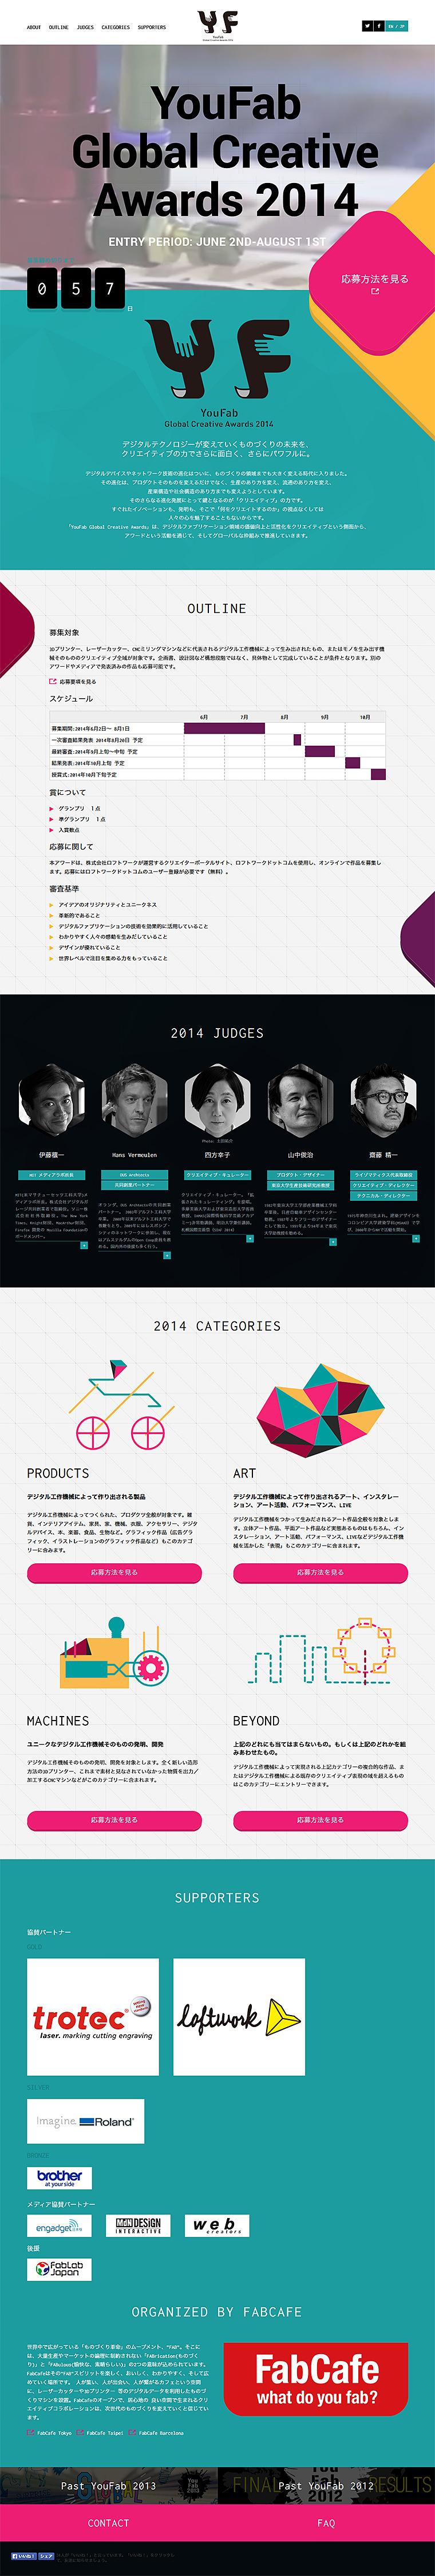 YouFab Global Creative Awards 2014